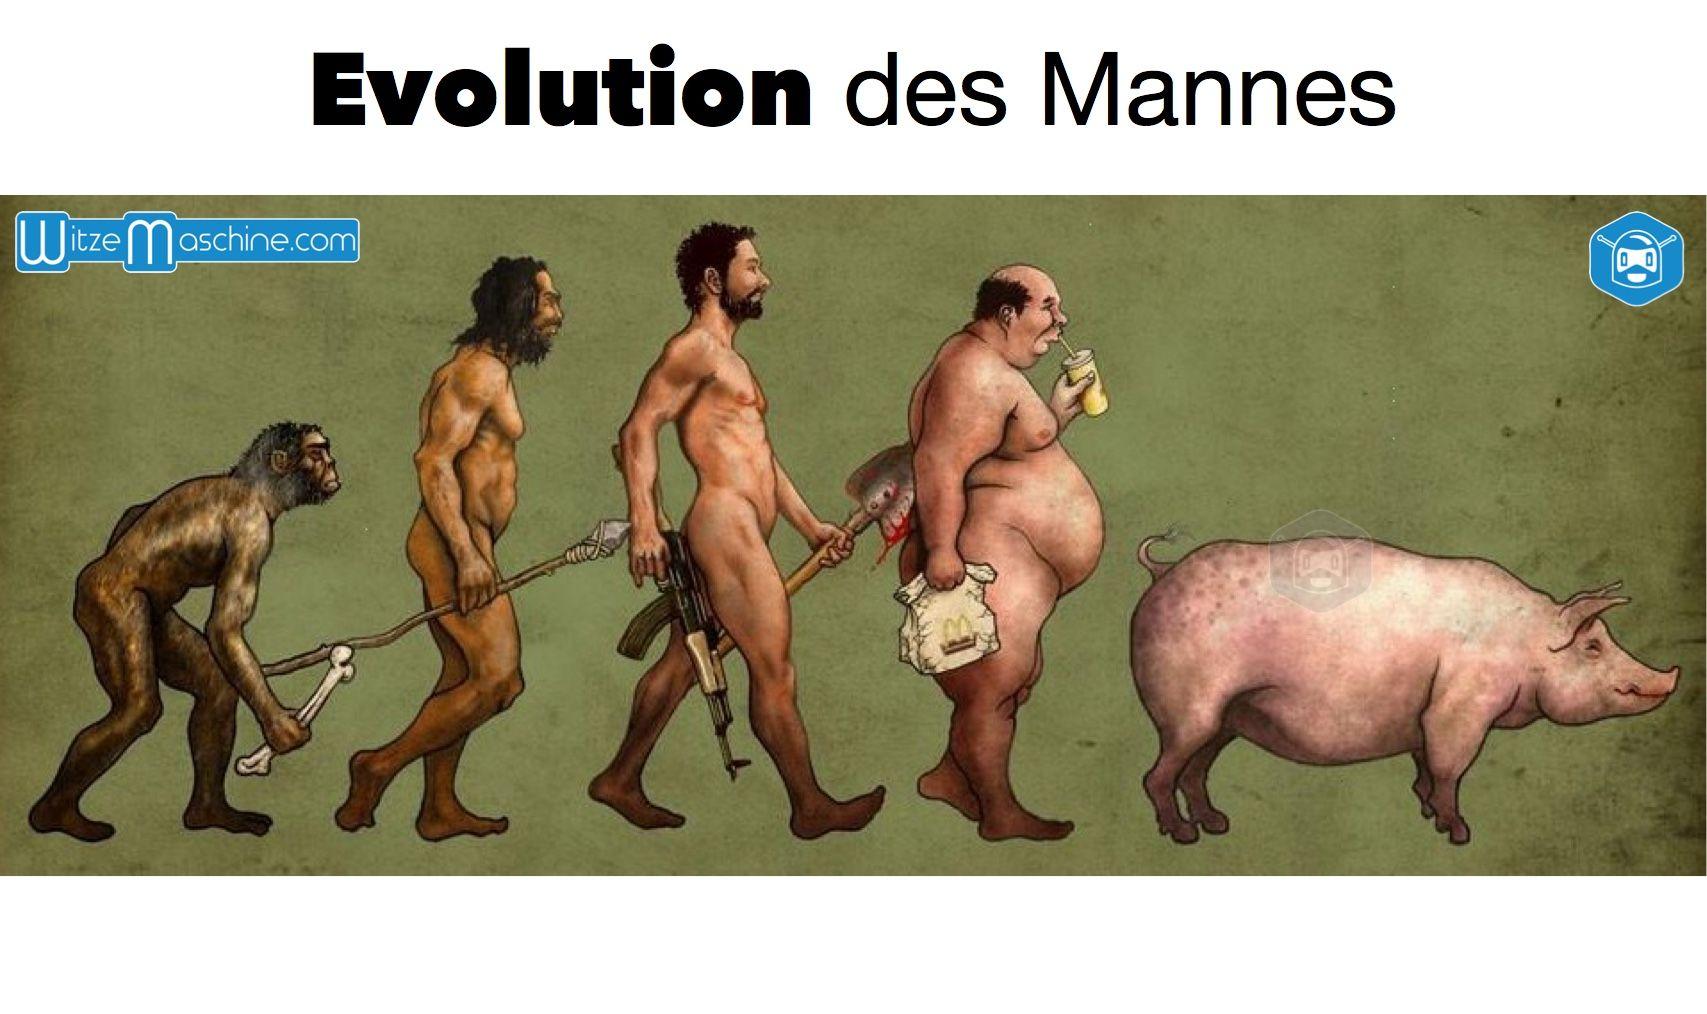 Evolution Des Mannes Witzig Funny Evolution Men Bilder Witzig